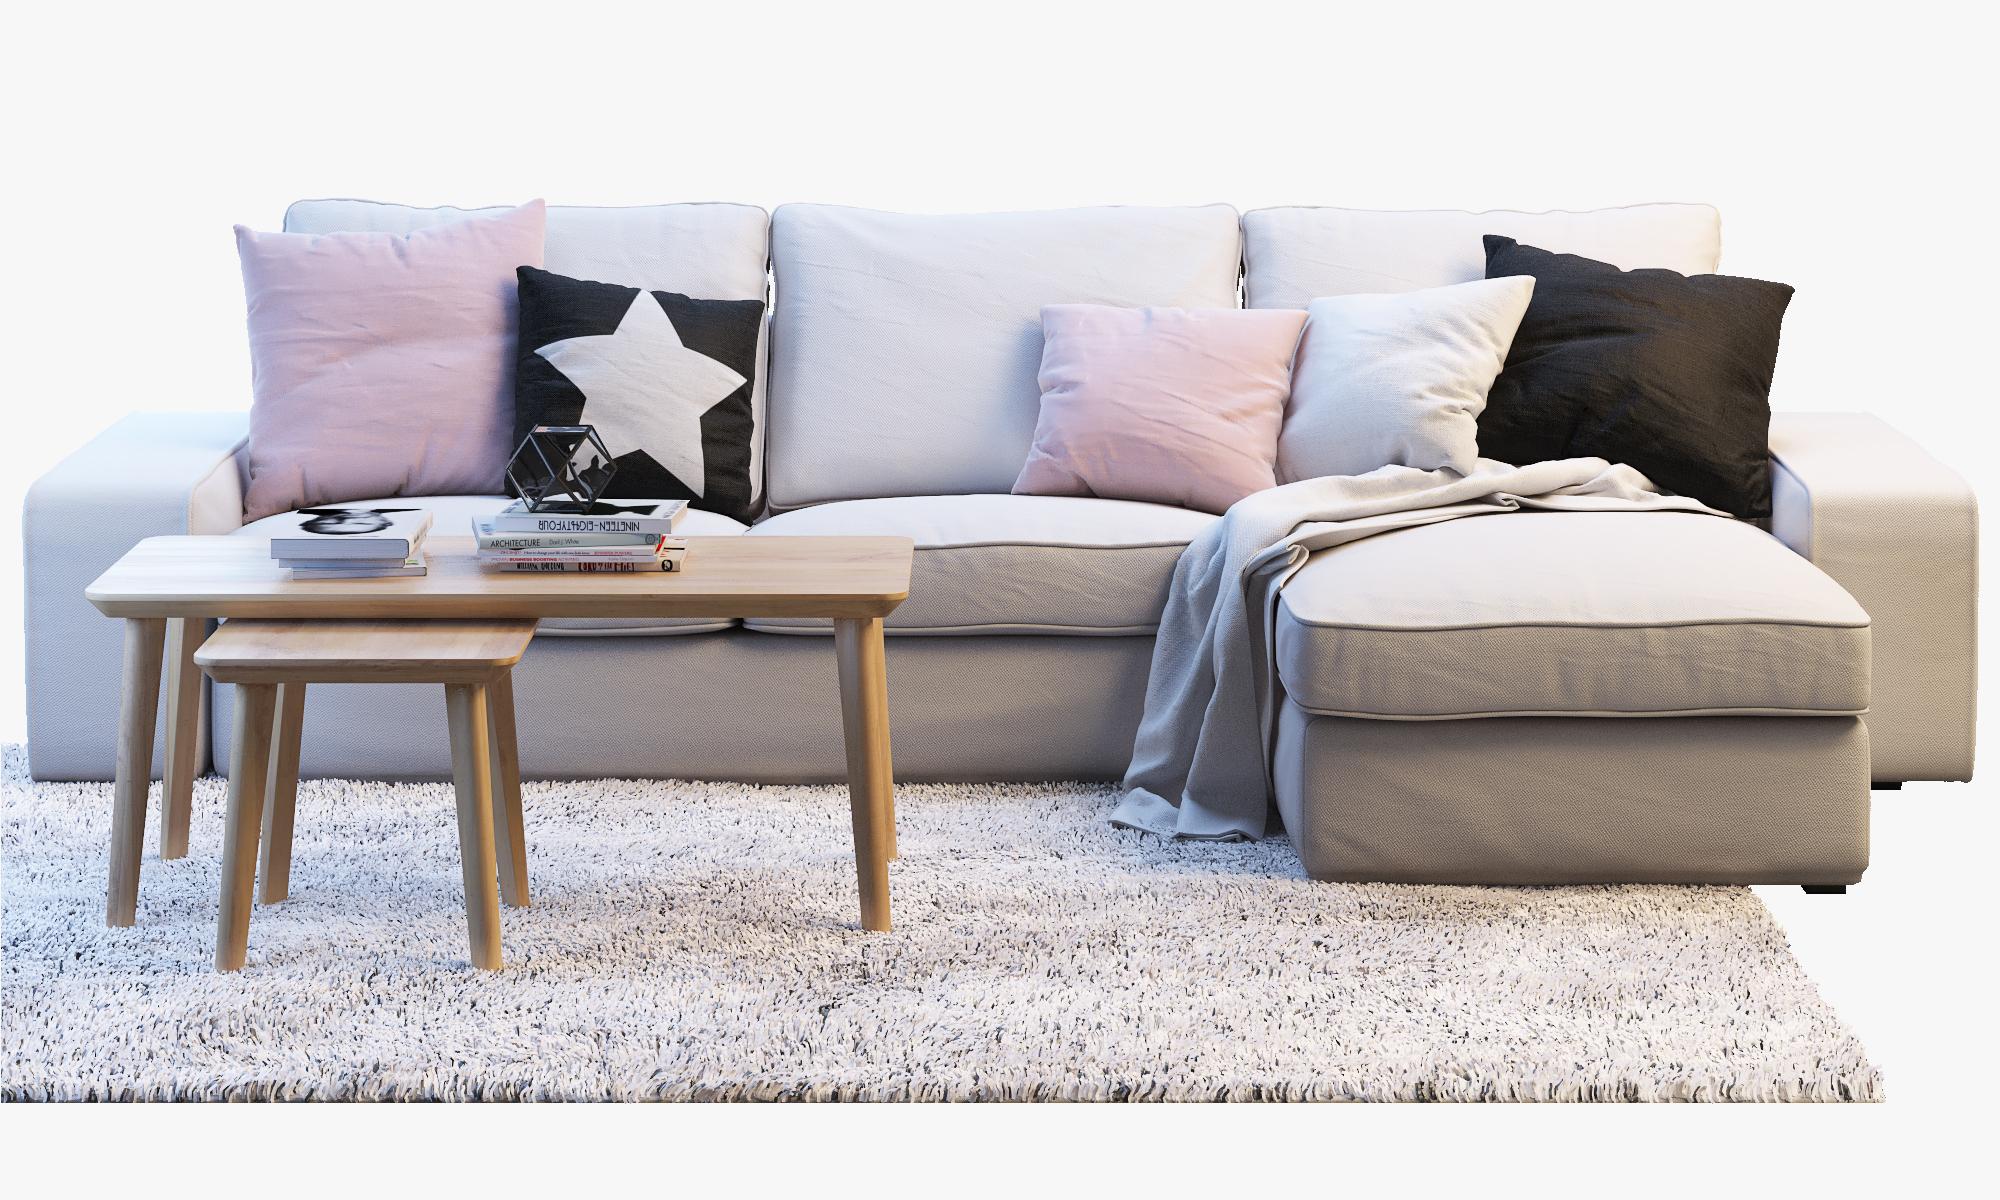 Tremendous Ikea Kivik Two Seat Sofa With Chaise Longue Uwap Interior Chair Design Uwaporg